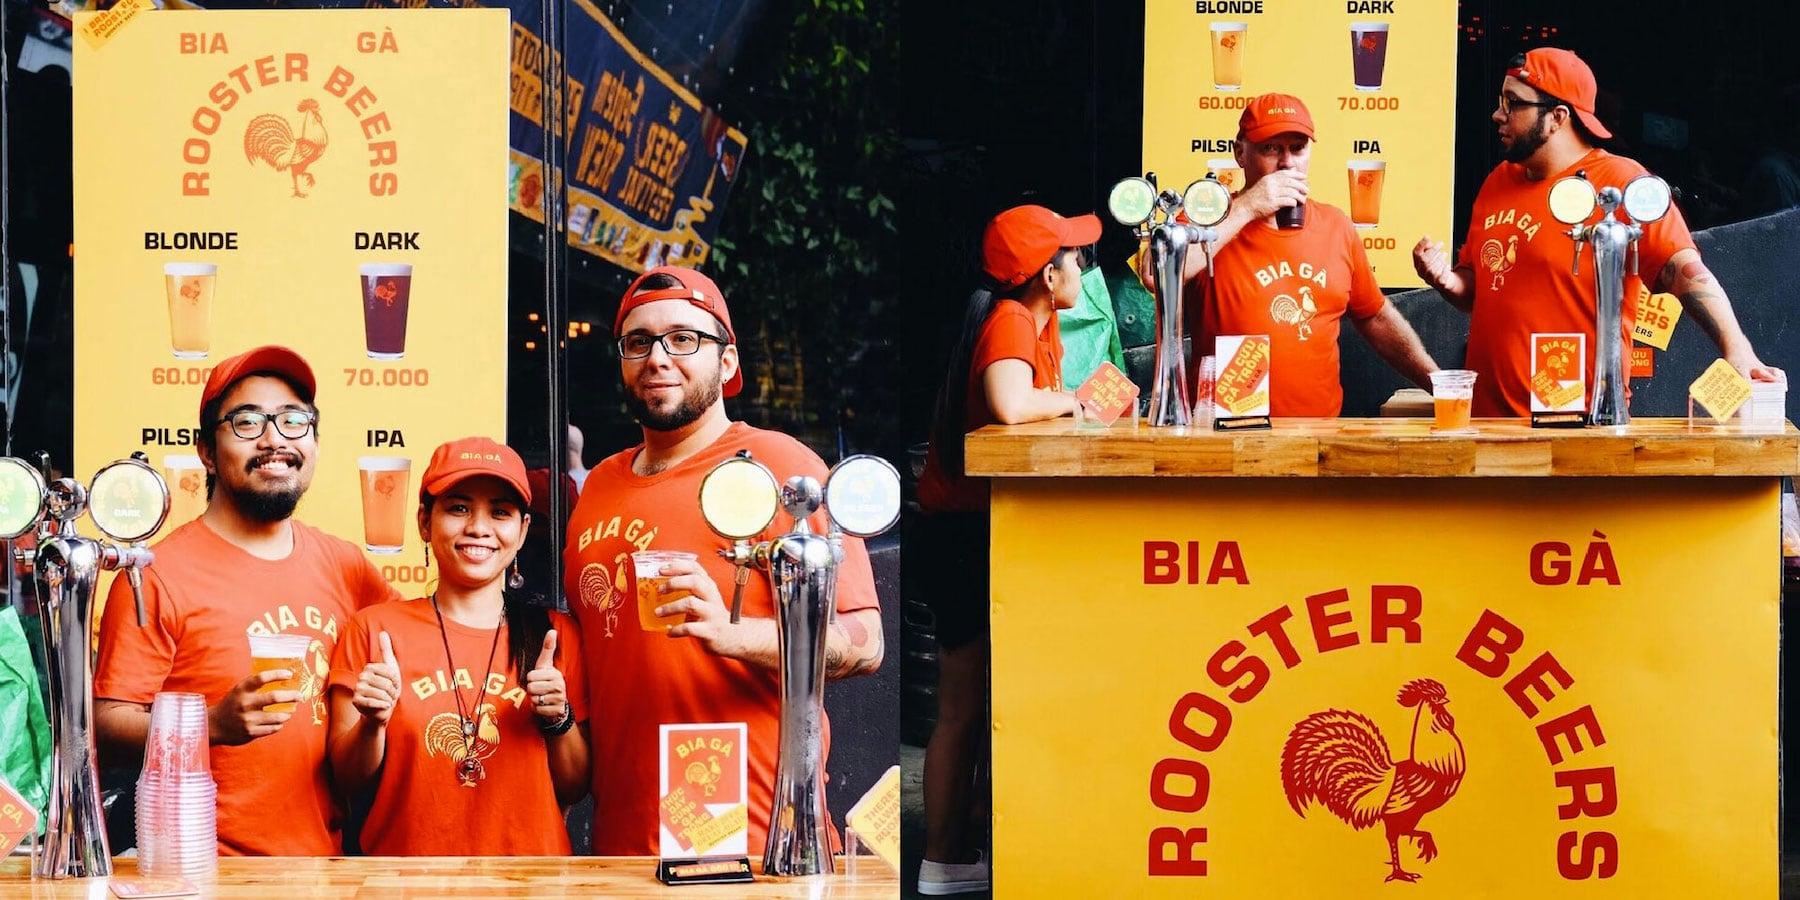 Rooster Beers